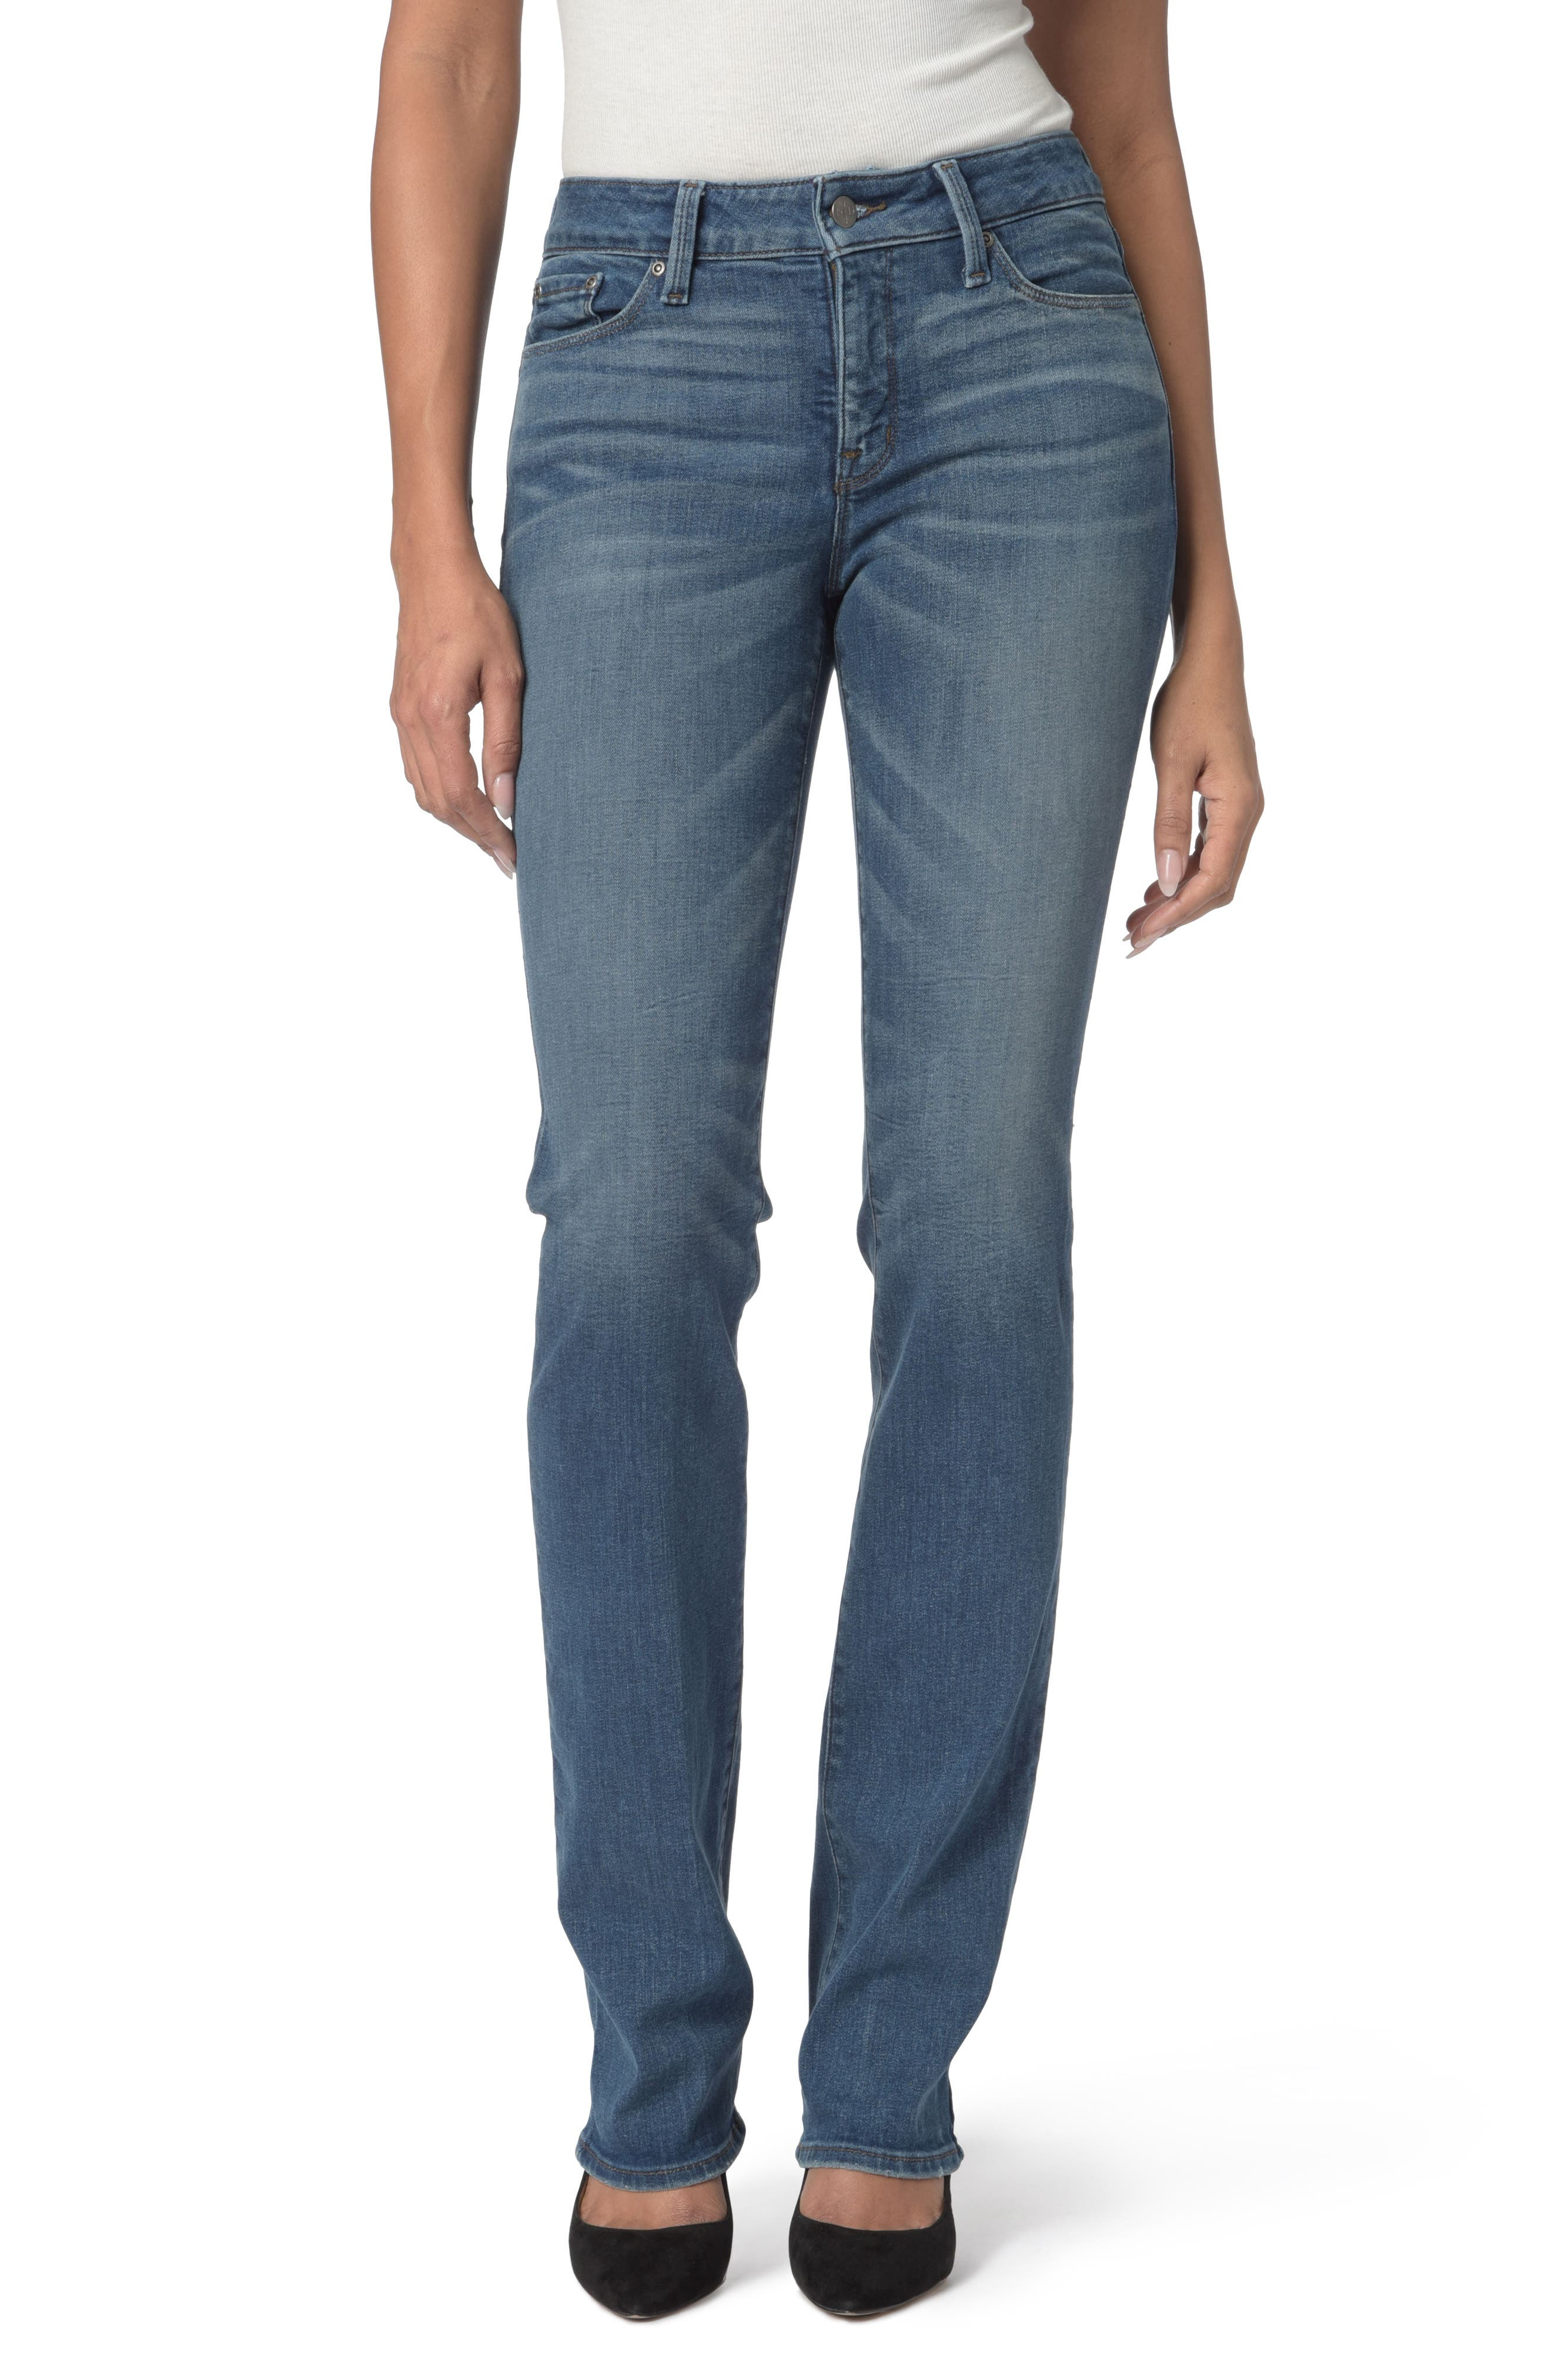 Main Image - NYDJ Marilyn Stretch Straight Leg Jeans (Regular & Petite)